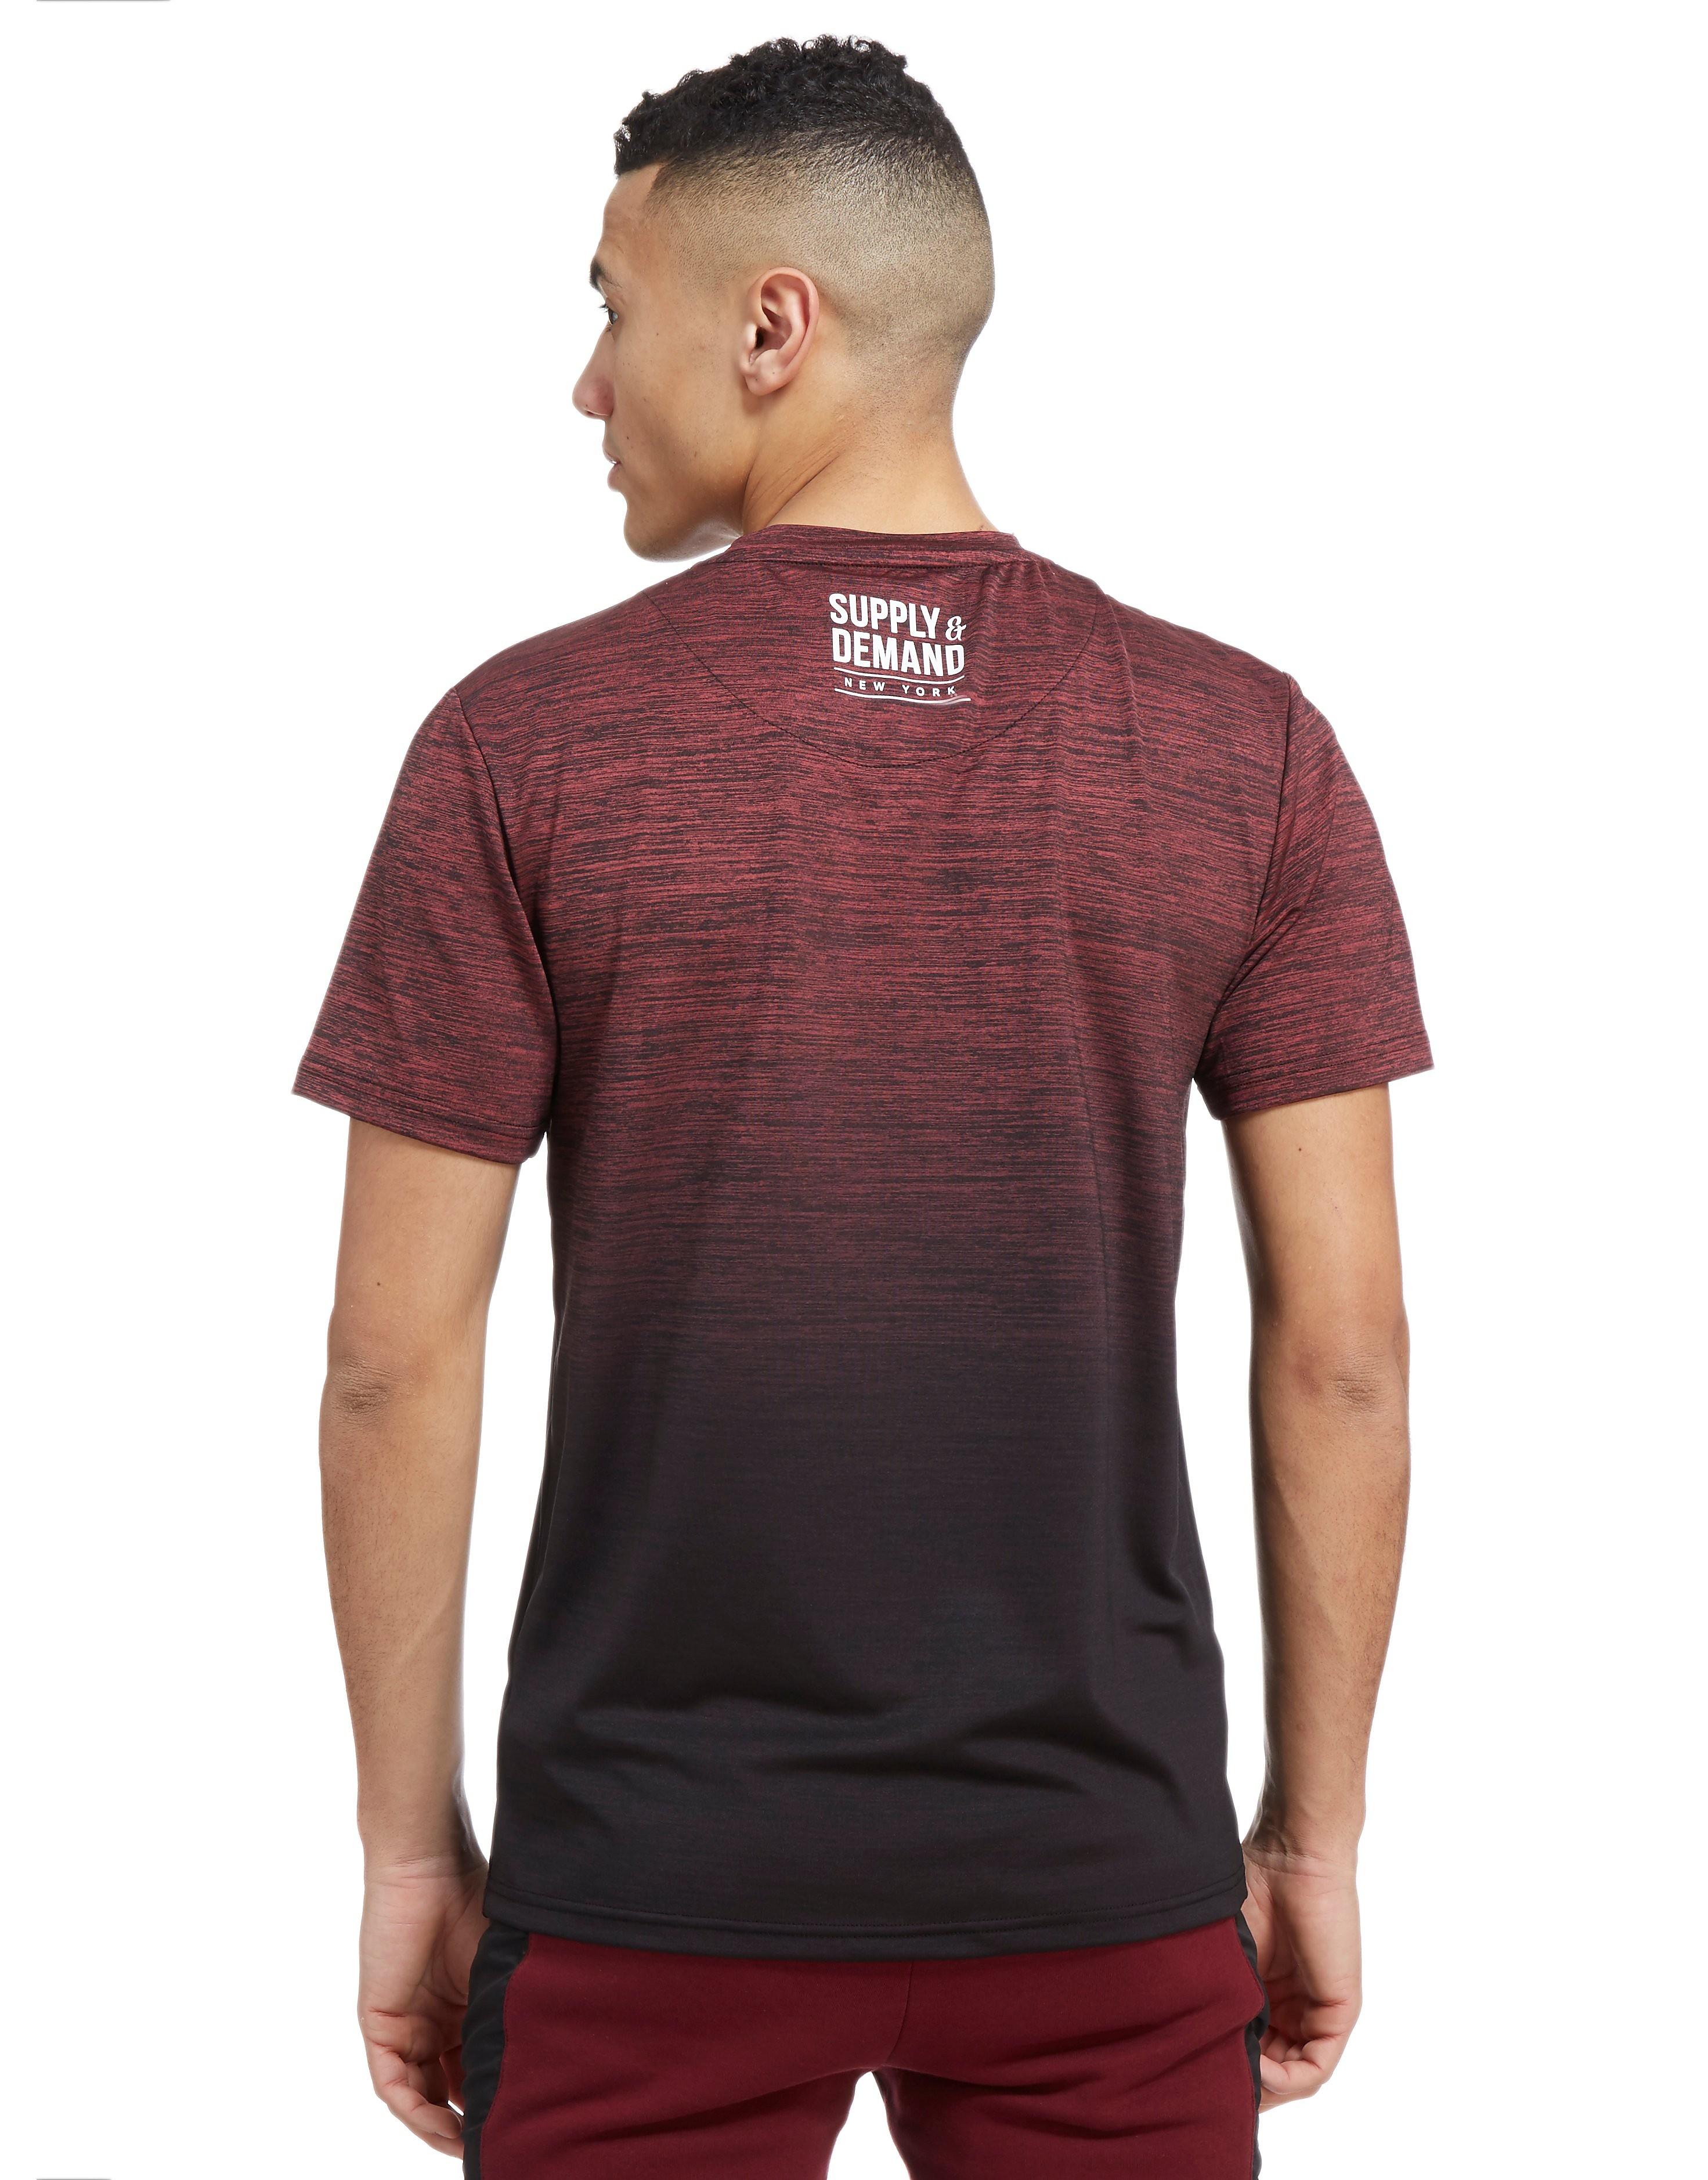 Supply & Demand Hendrick Fade T-Shirt